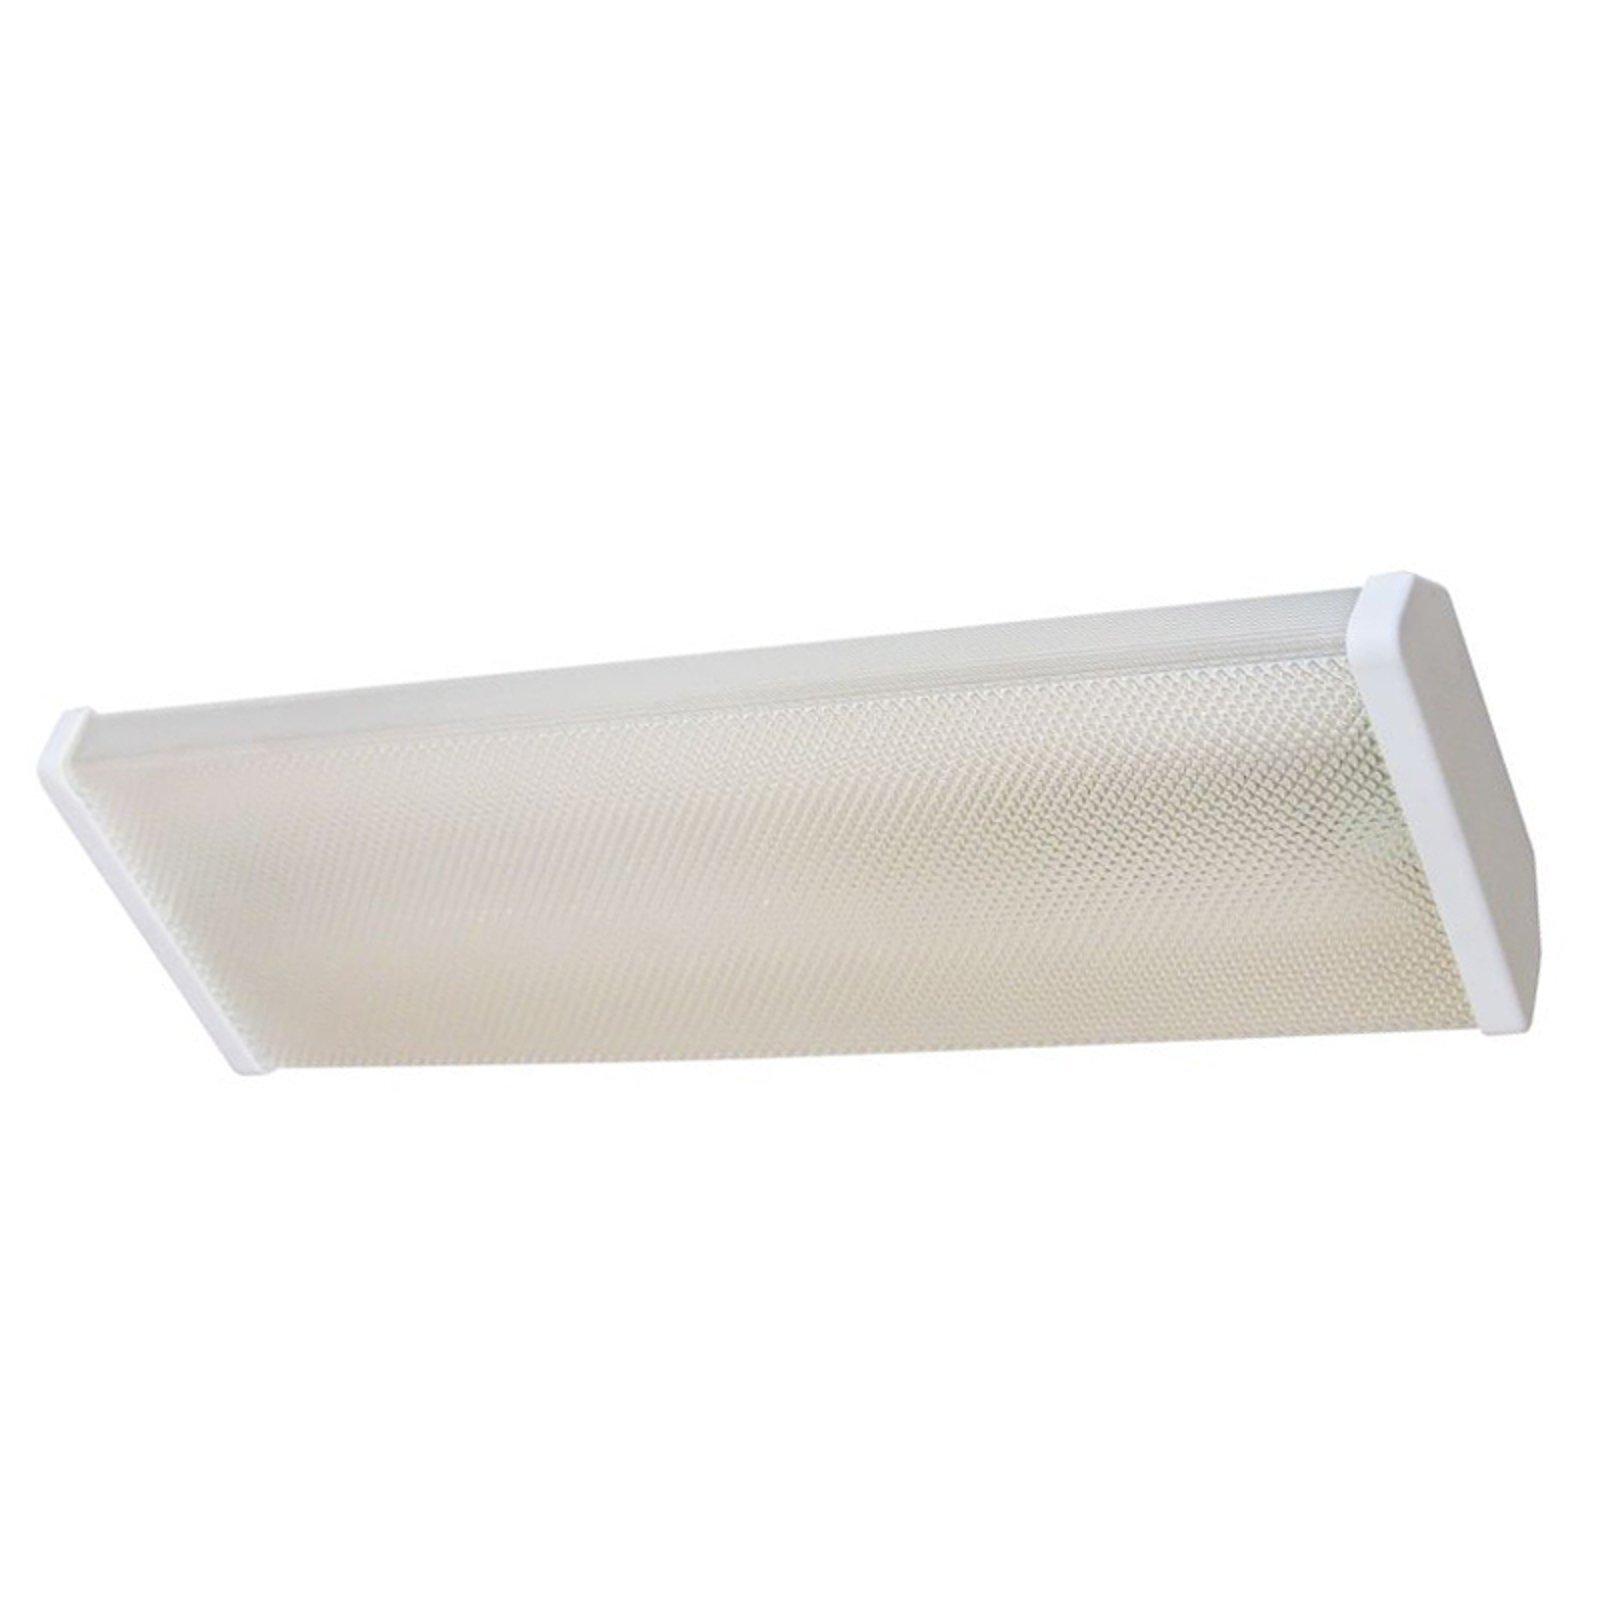 Lavt forbruks taklamper Prismatik LED 10 W